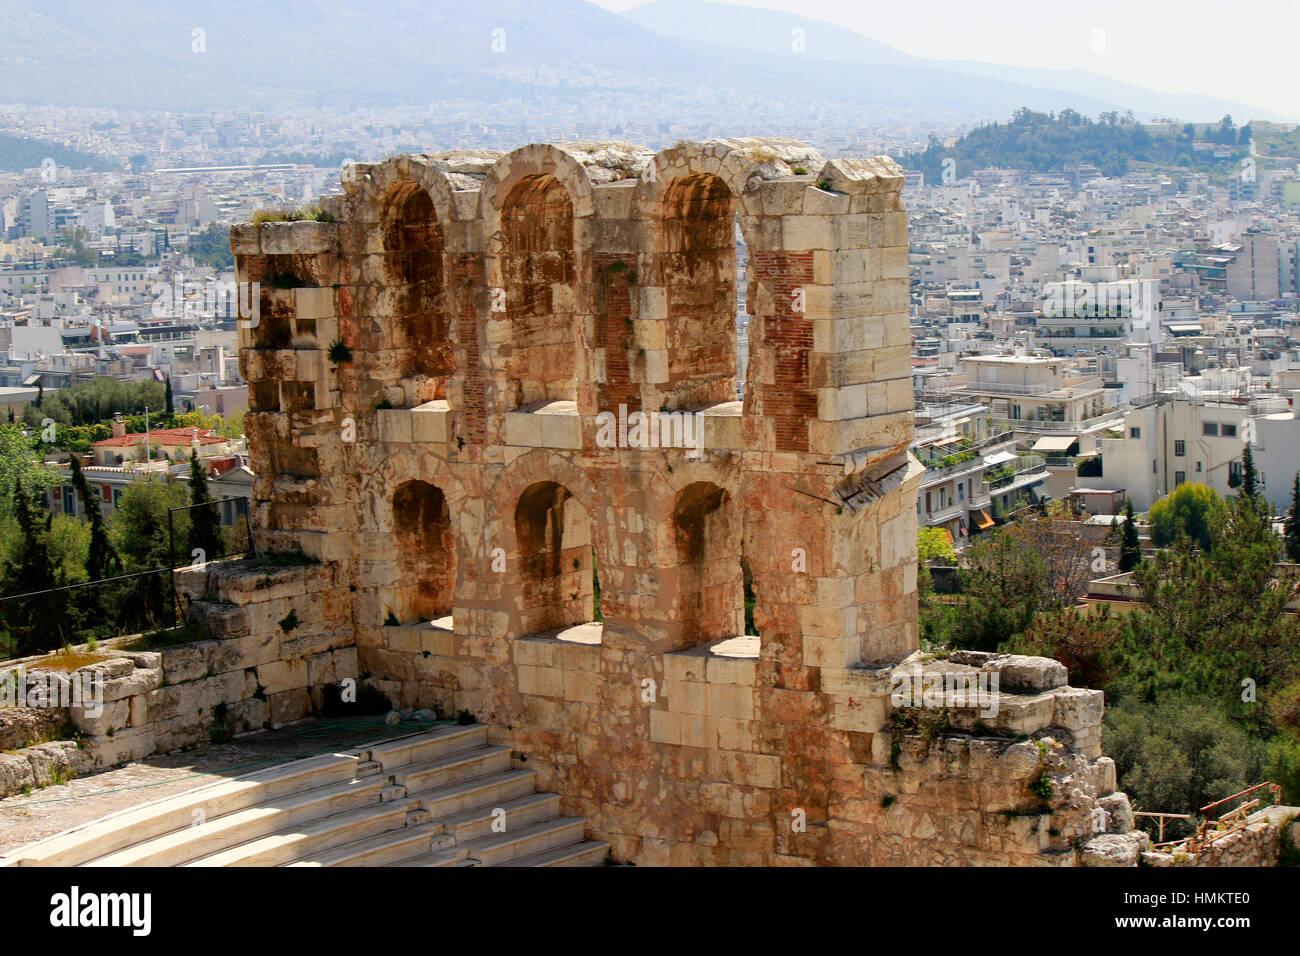 Odeon des Herodes Atticus, Akropolis, Athen, Griechenland. Stock Photo